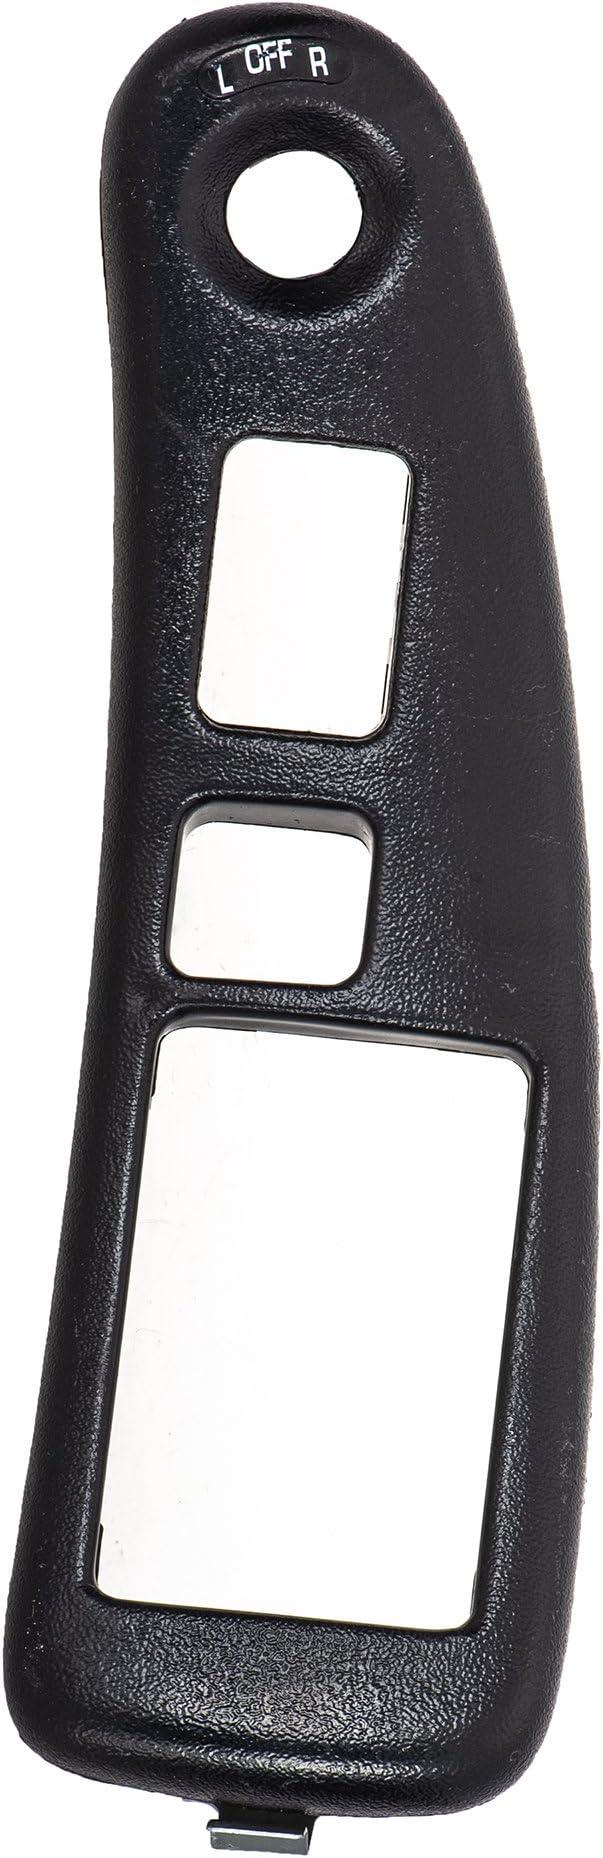 OEM NEW Front Driver Side Window Switch Bezel Black 97-03 Grand Prix 10420343